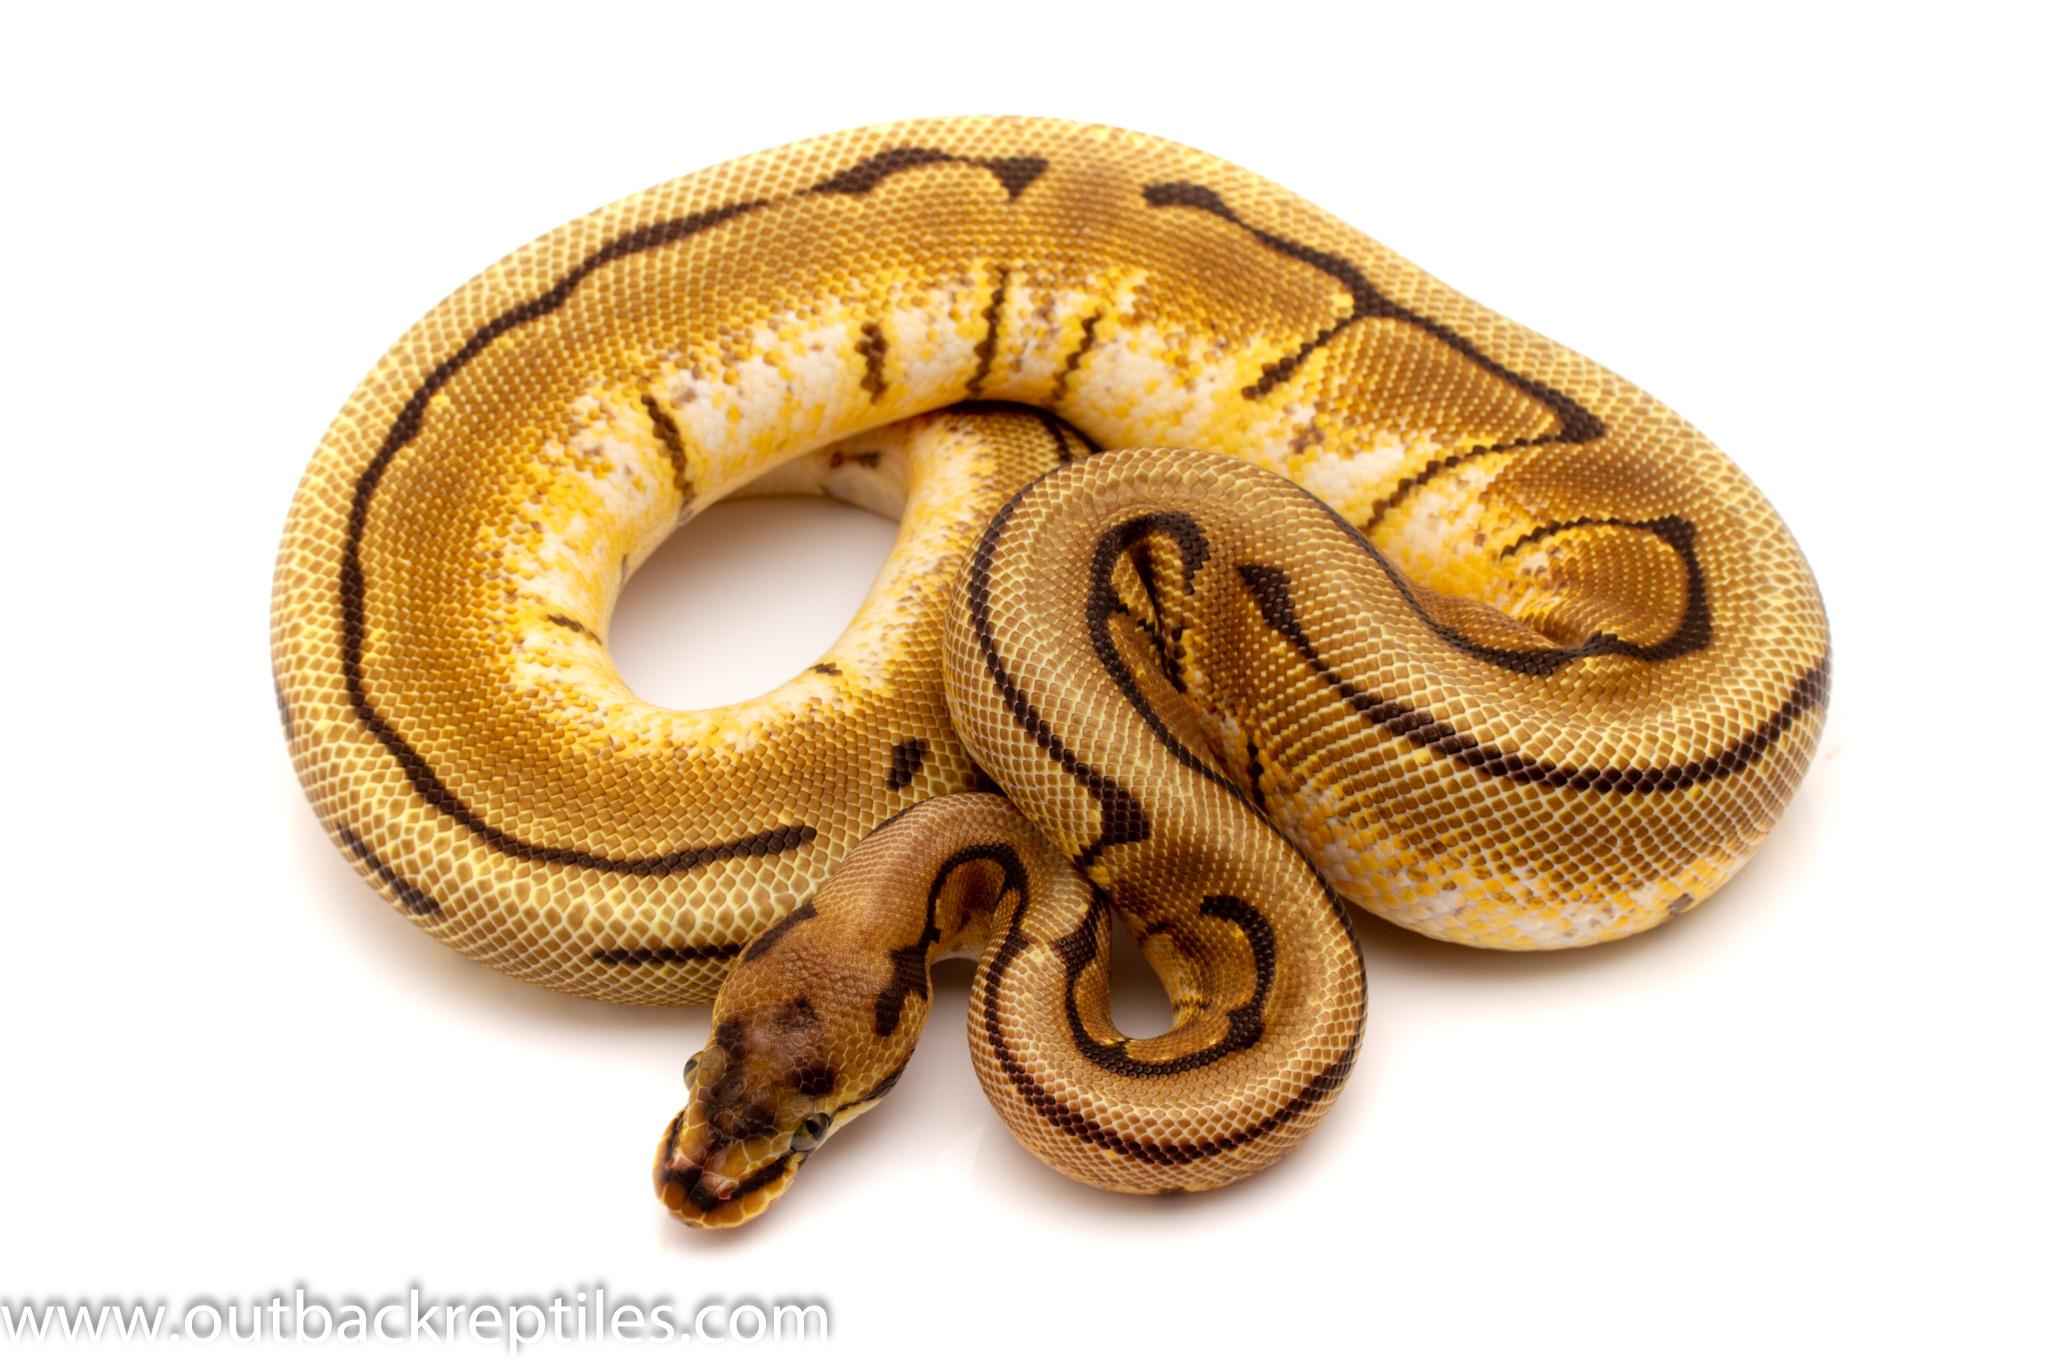 spinner ball python for sale